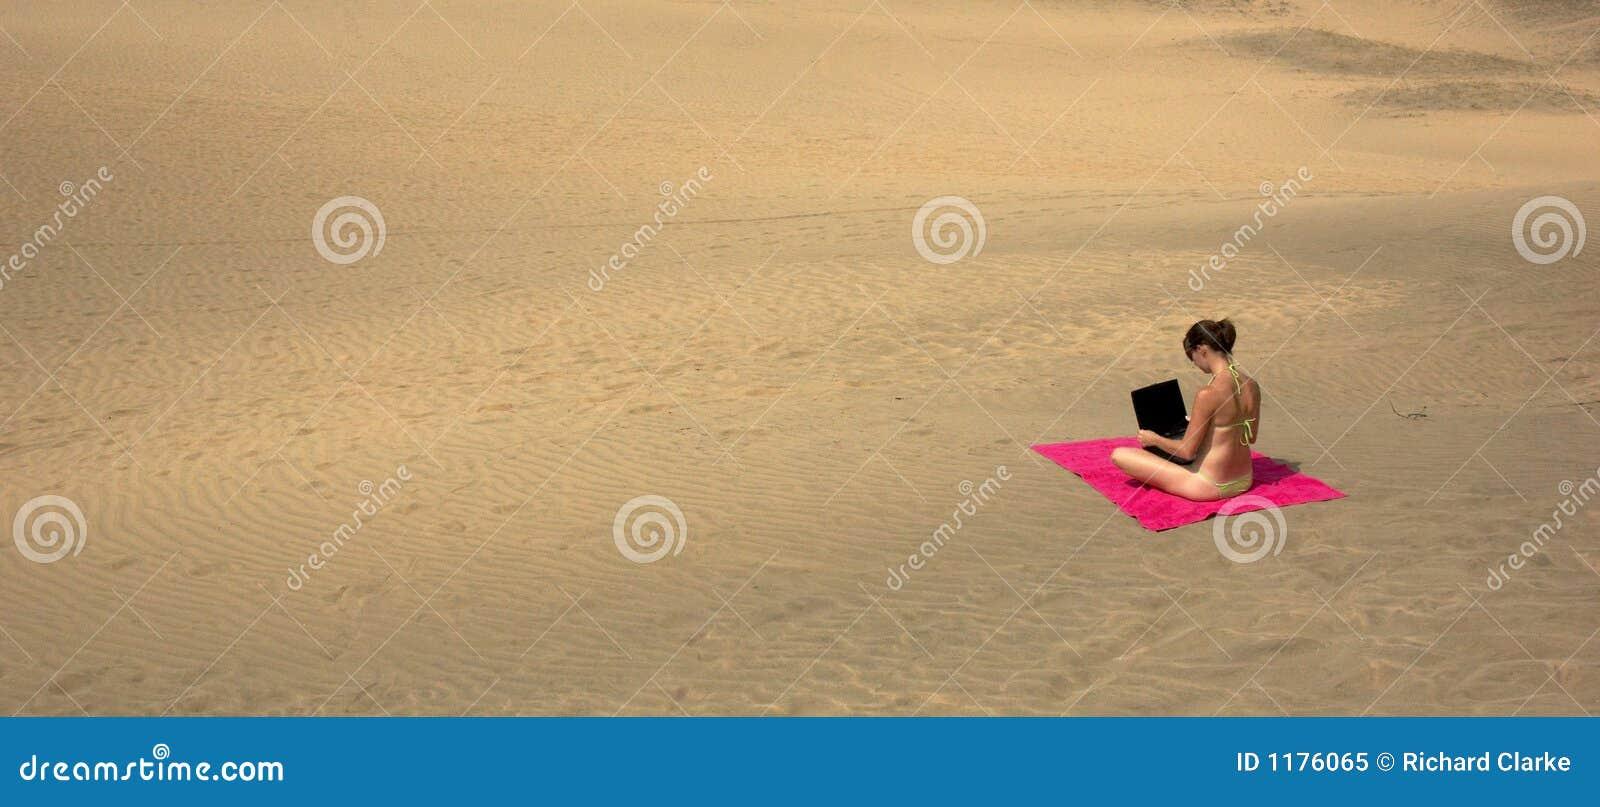 Desert Laptop Royalty Free Stock Photo Image 1176065